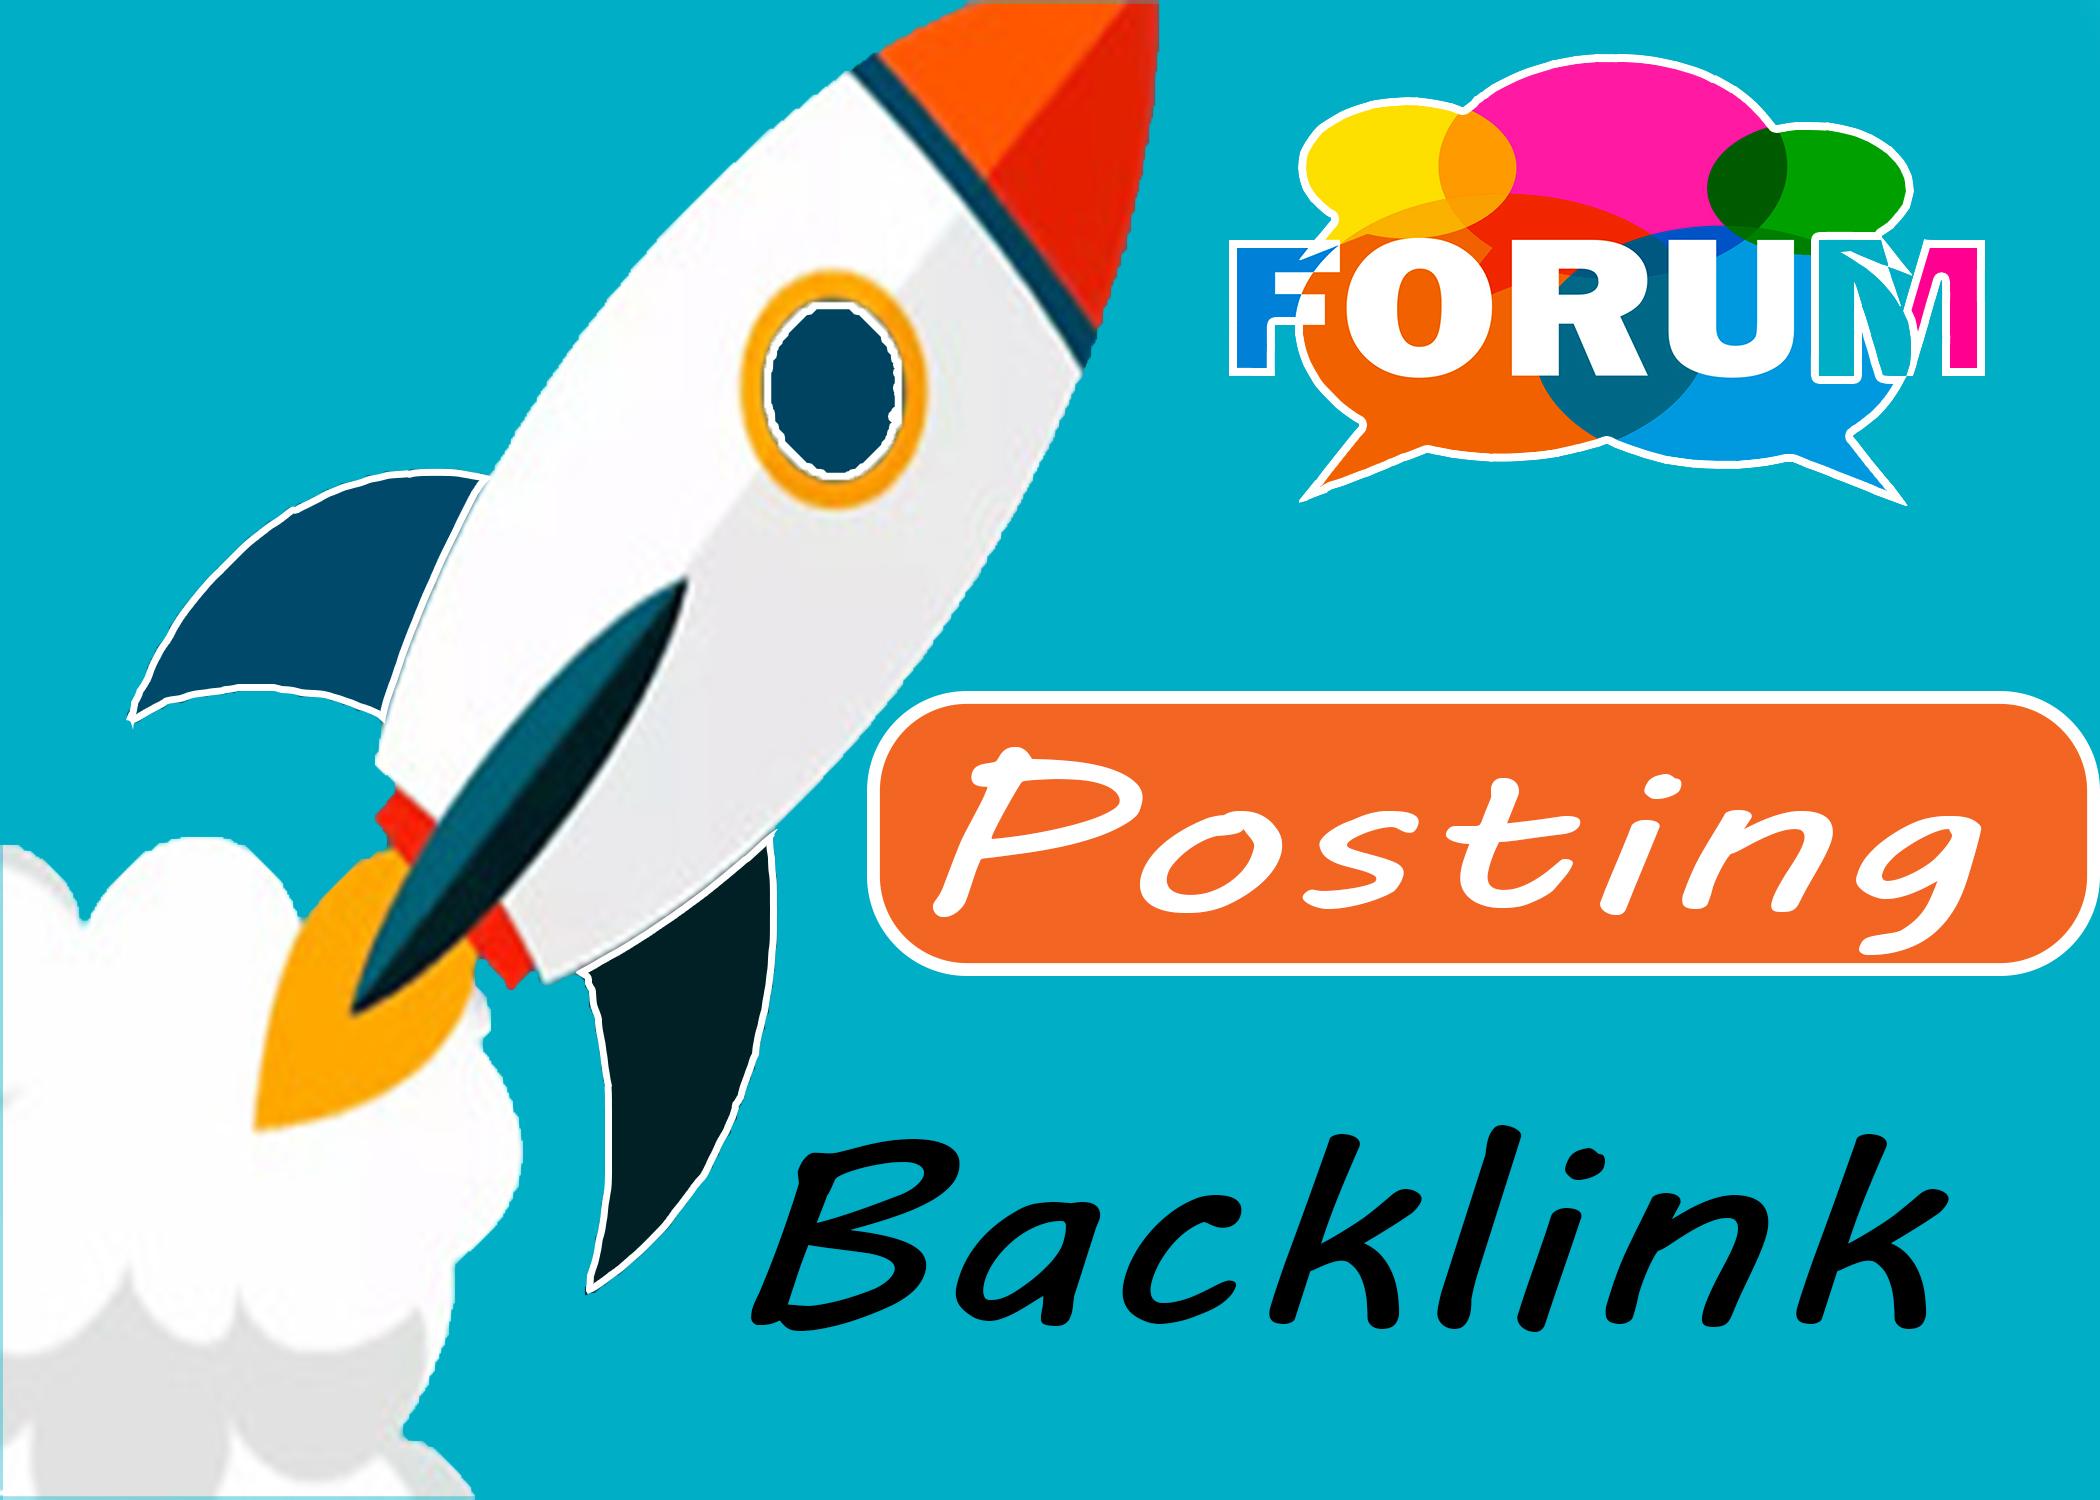 60 high quality Create Manually DofoIIow Forum Posting Backlink